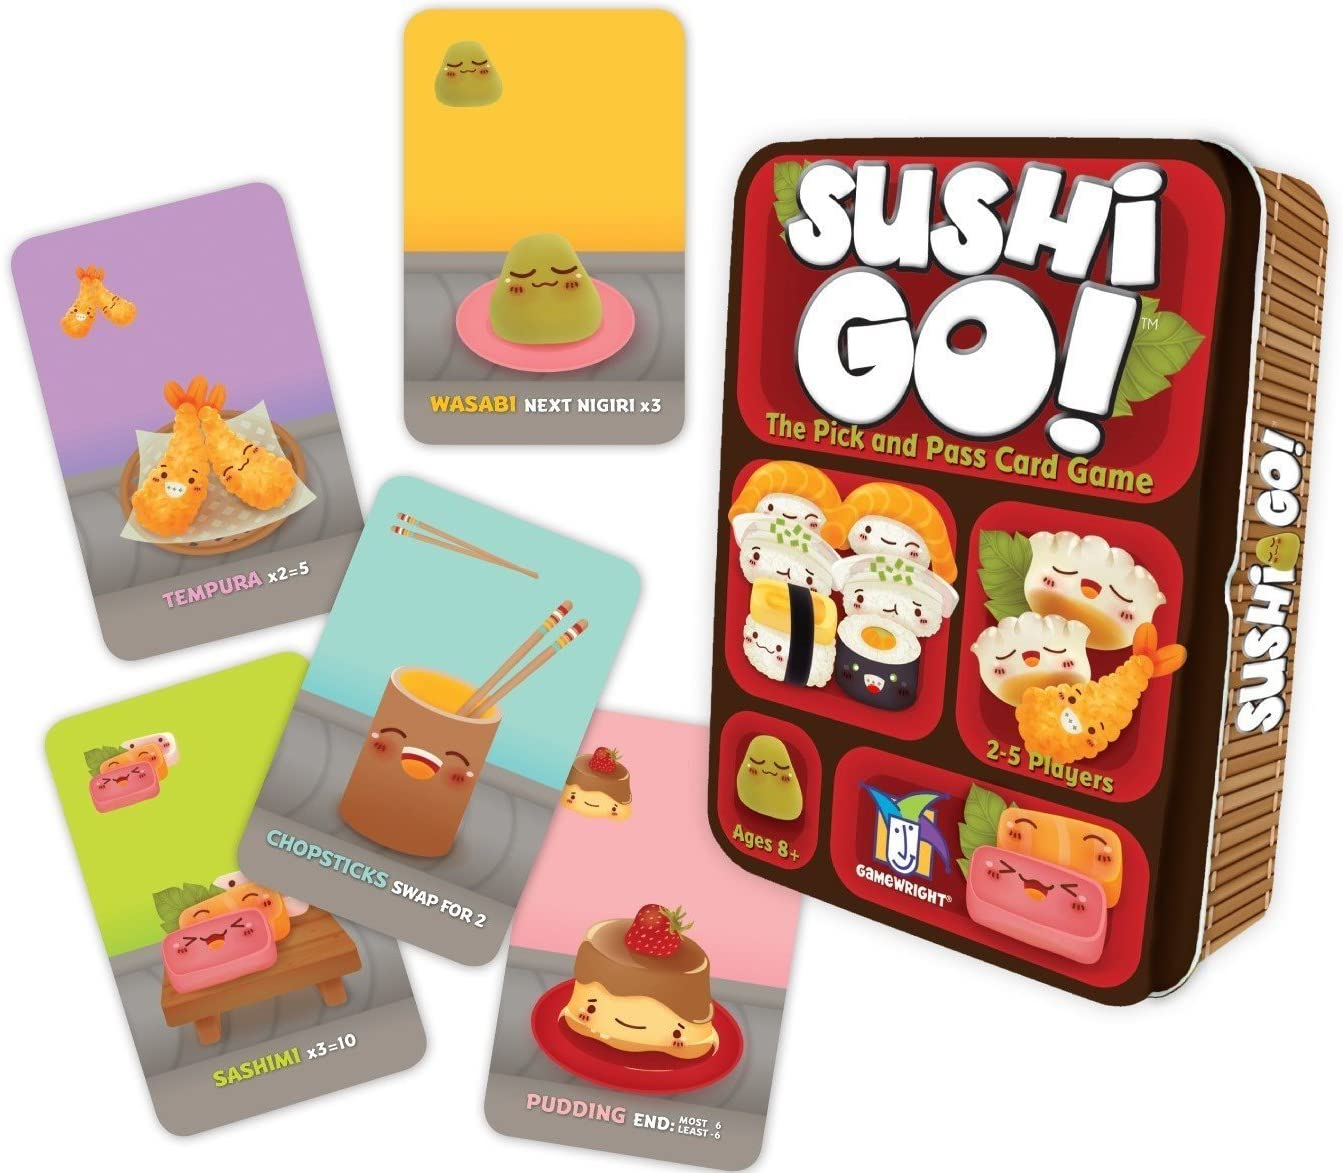 Análisis de Sushi Go!